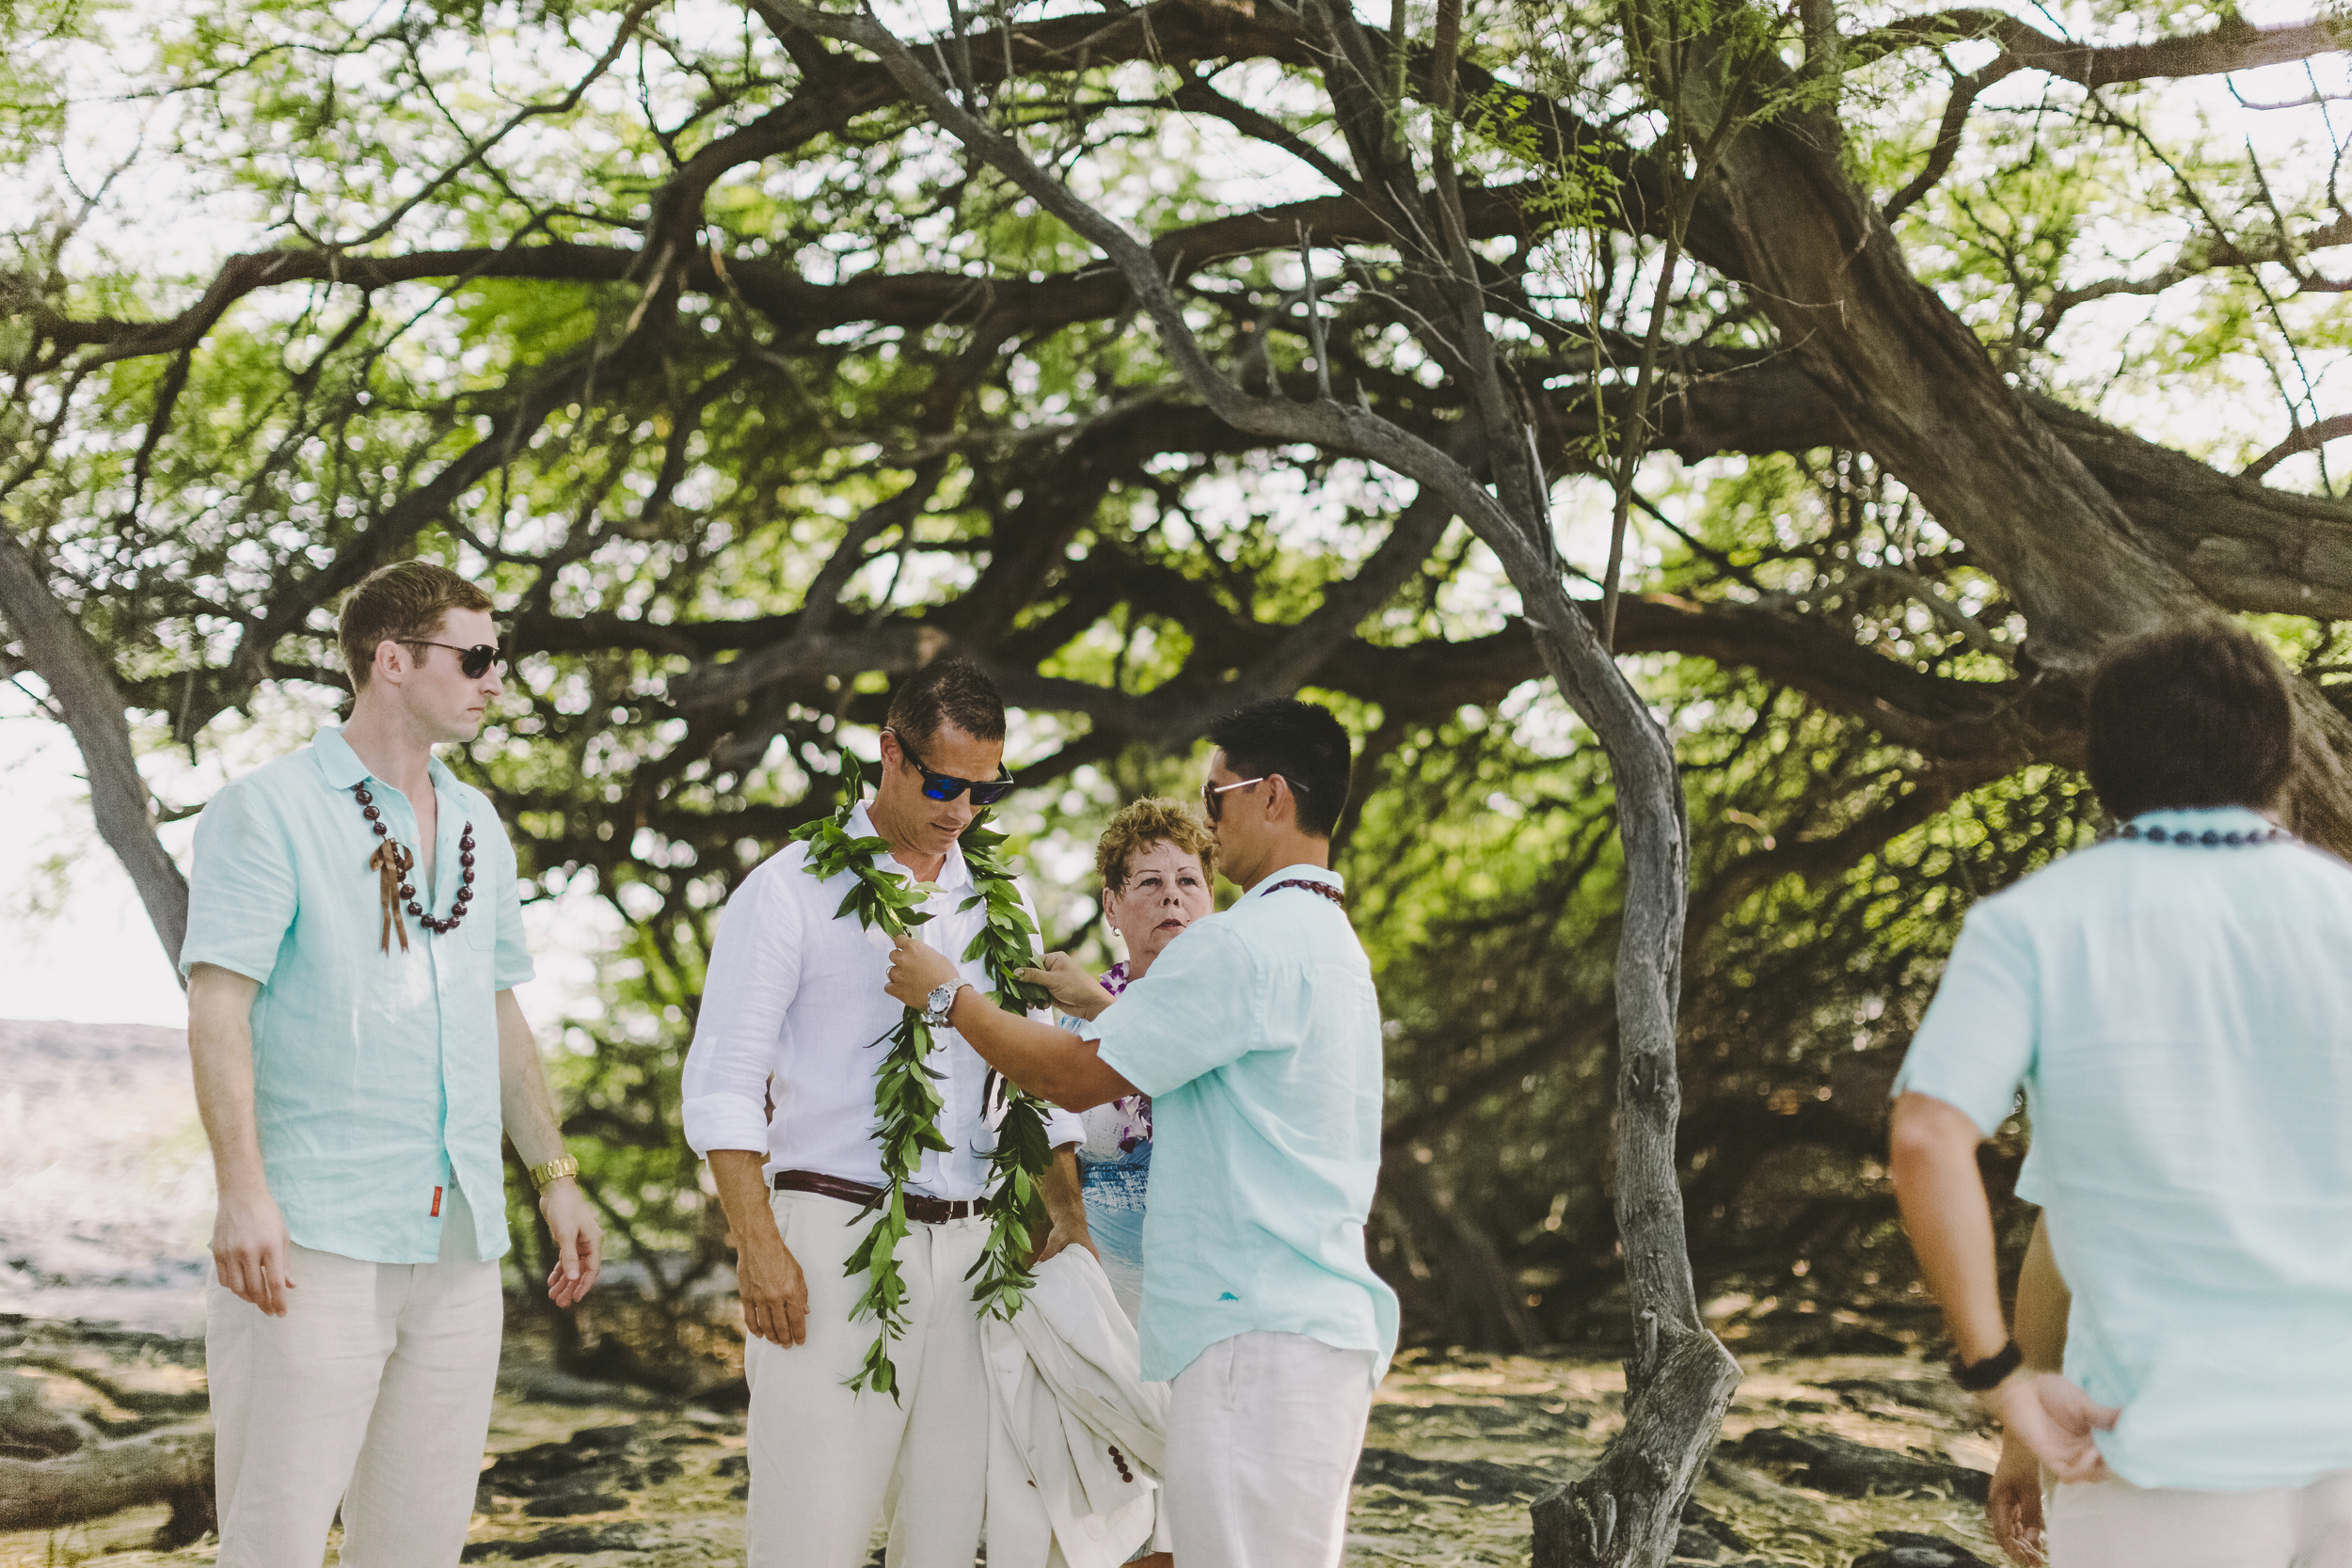 angie-diaz-photography-hawaii-wedding-photographer-kelli-jay-42.jpg